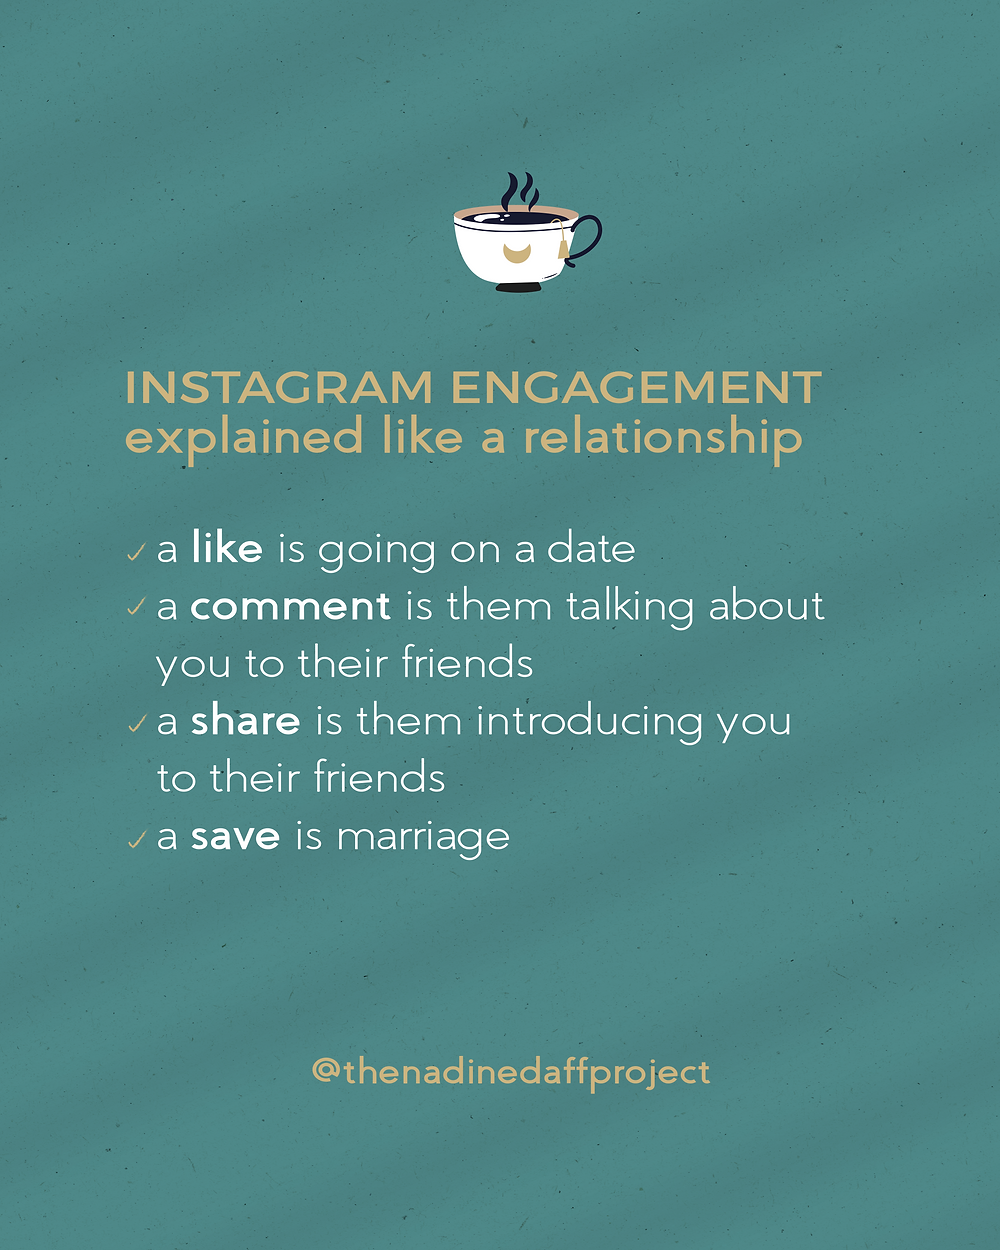 Instagram engagement tip